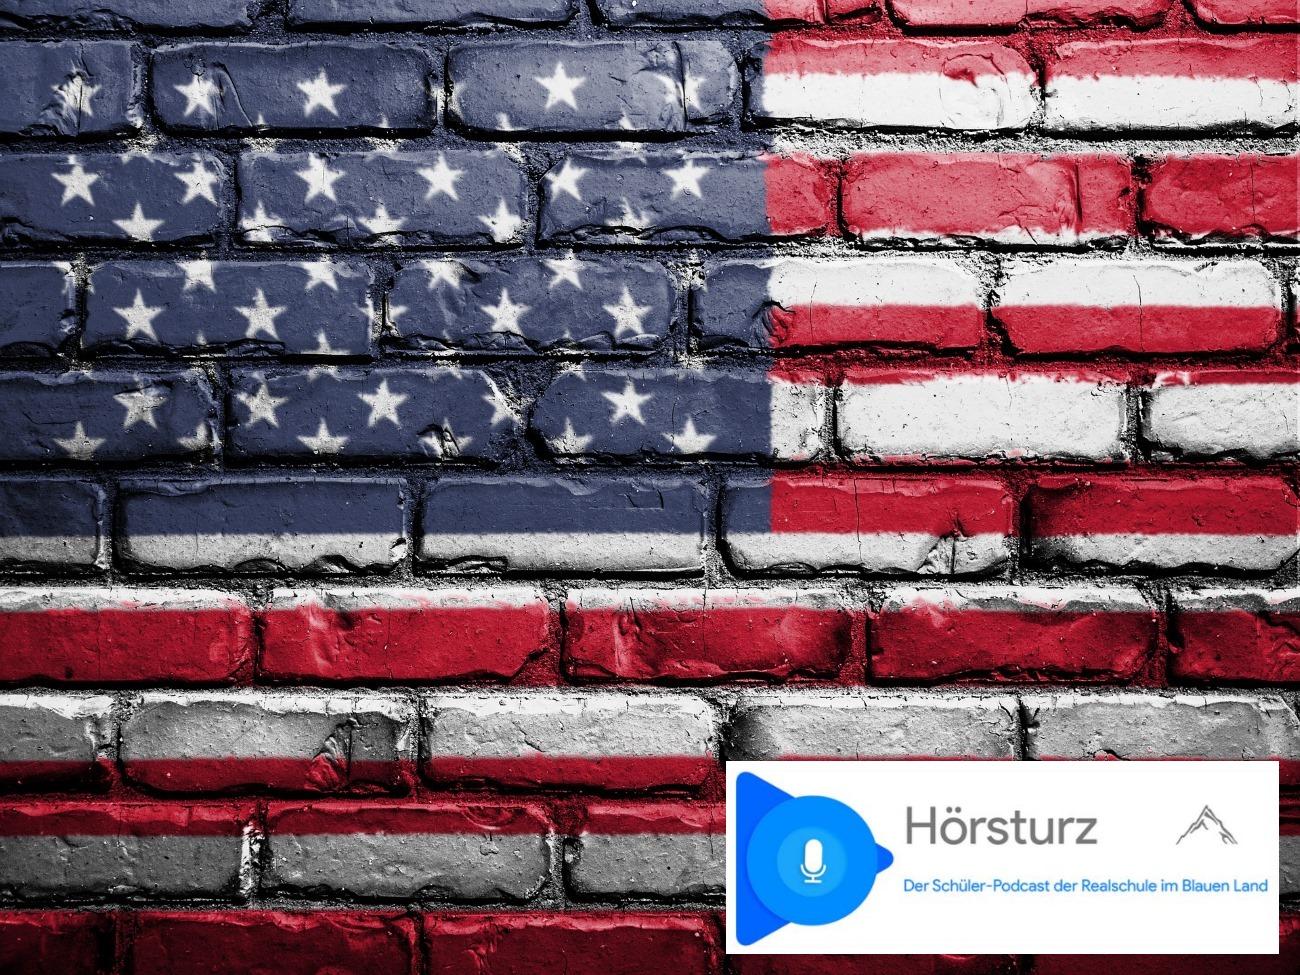 #hörsturz Schülerpodcast-Folge 6: Die USA – Sehnsuchtsland?